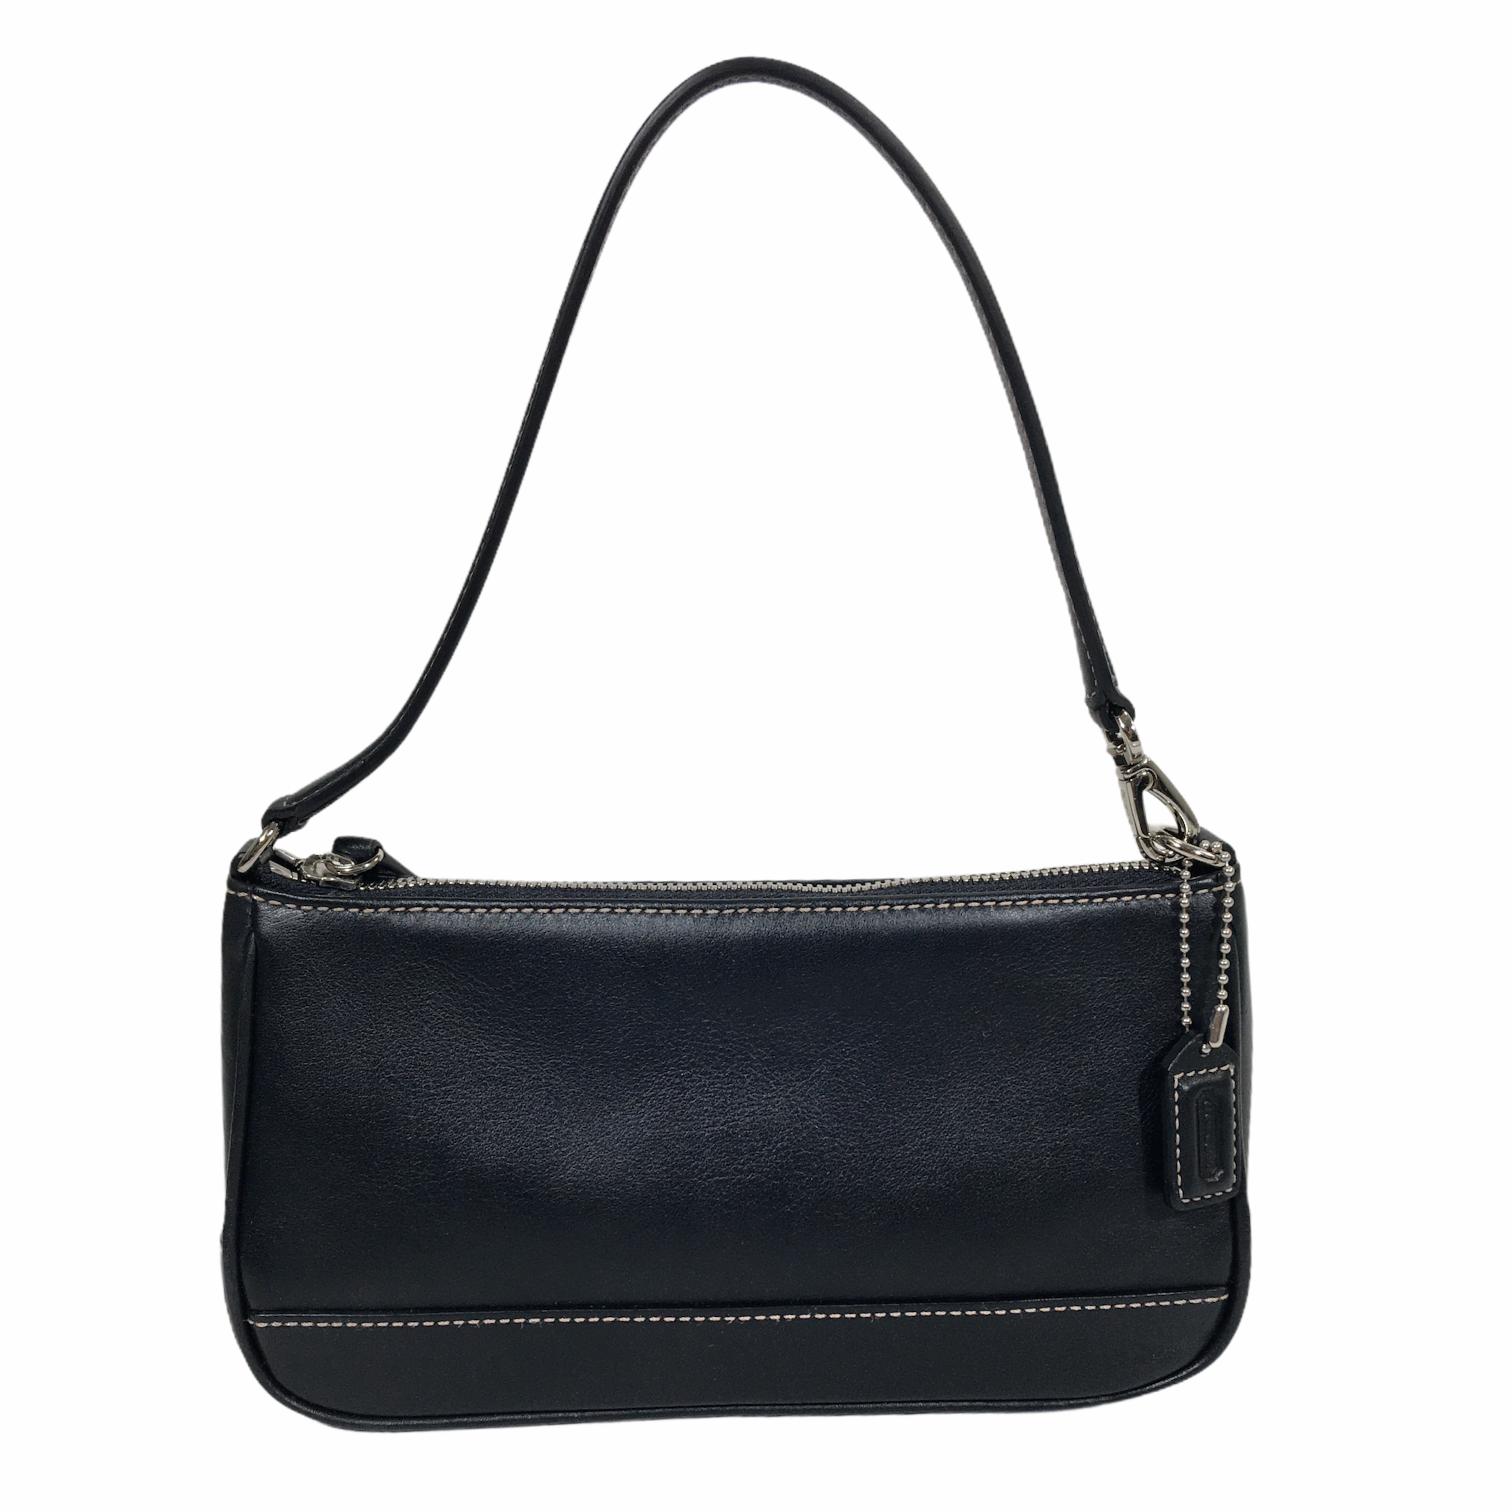 Coach Mini Leather Purse, Black, Size: Designer B